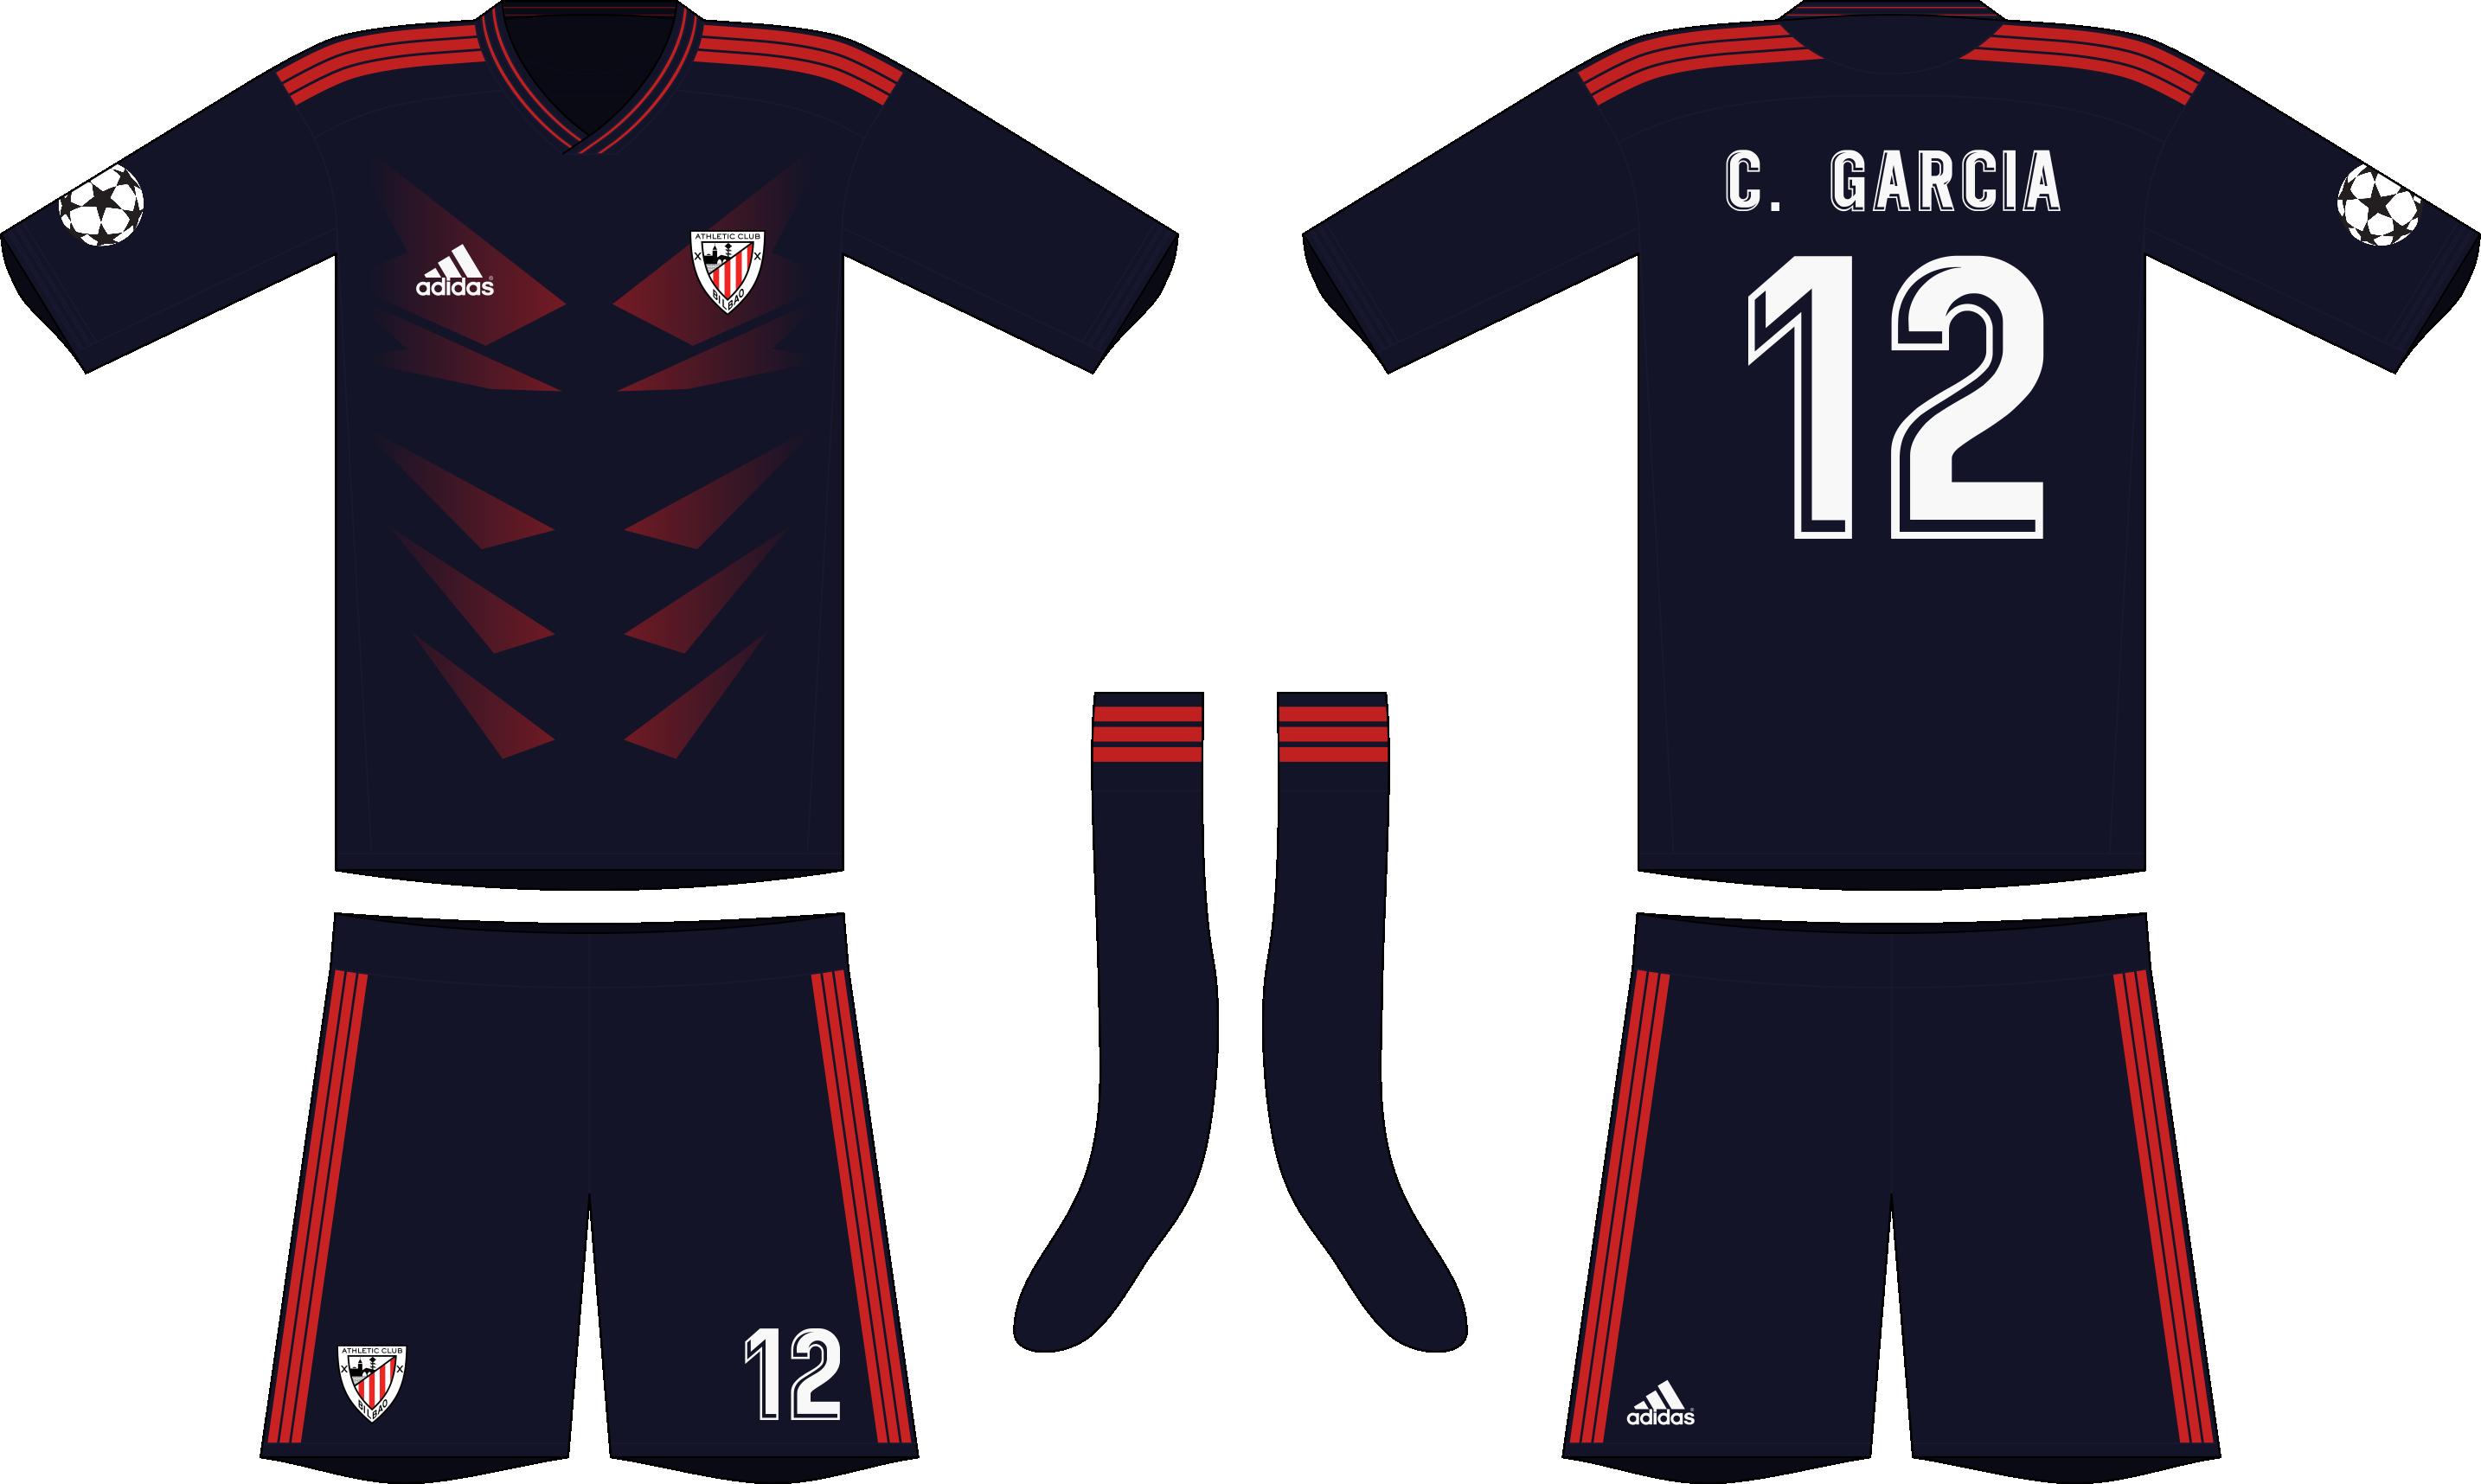 meet 1c8a2 0a68d Adidas Athletic Bilbao 2019-20 Away Kit